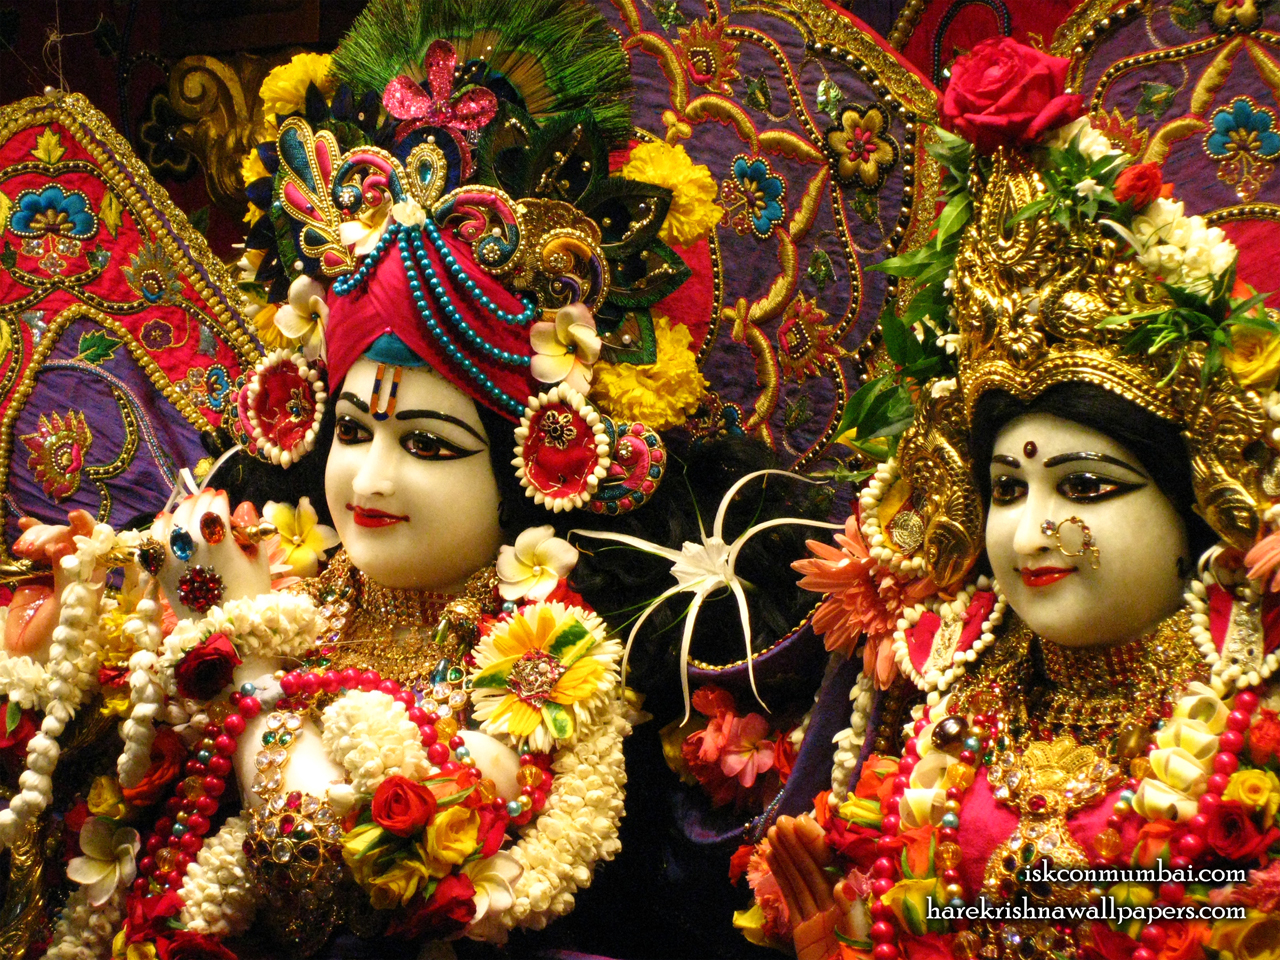 Sri Sri Radha Rasabihari Close up Wallpaper (013) Size 1280x960 Download